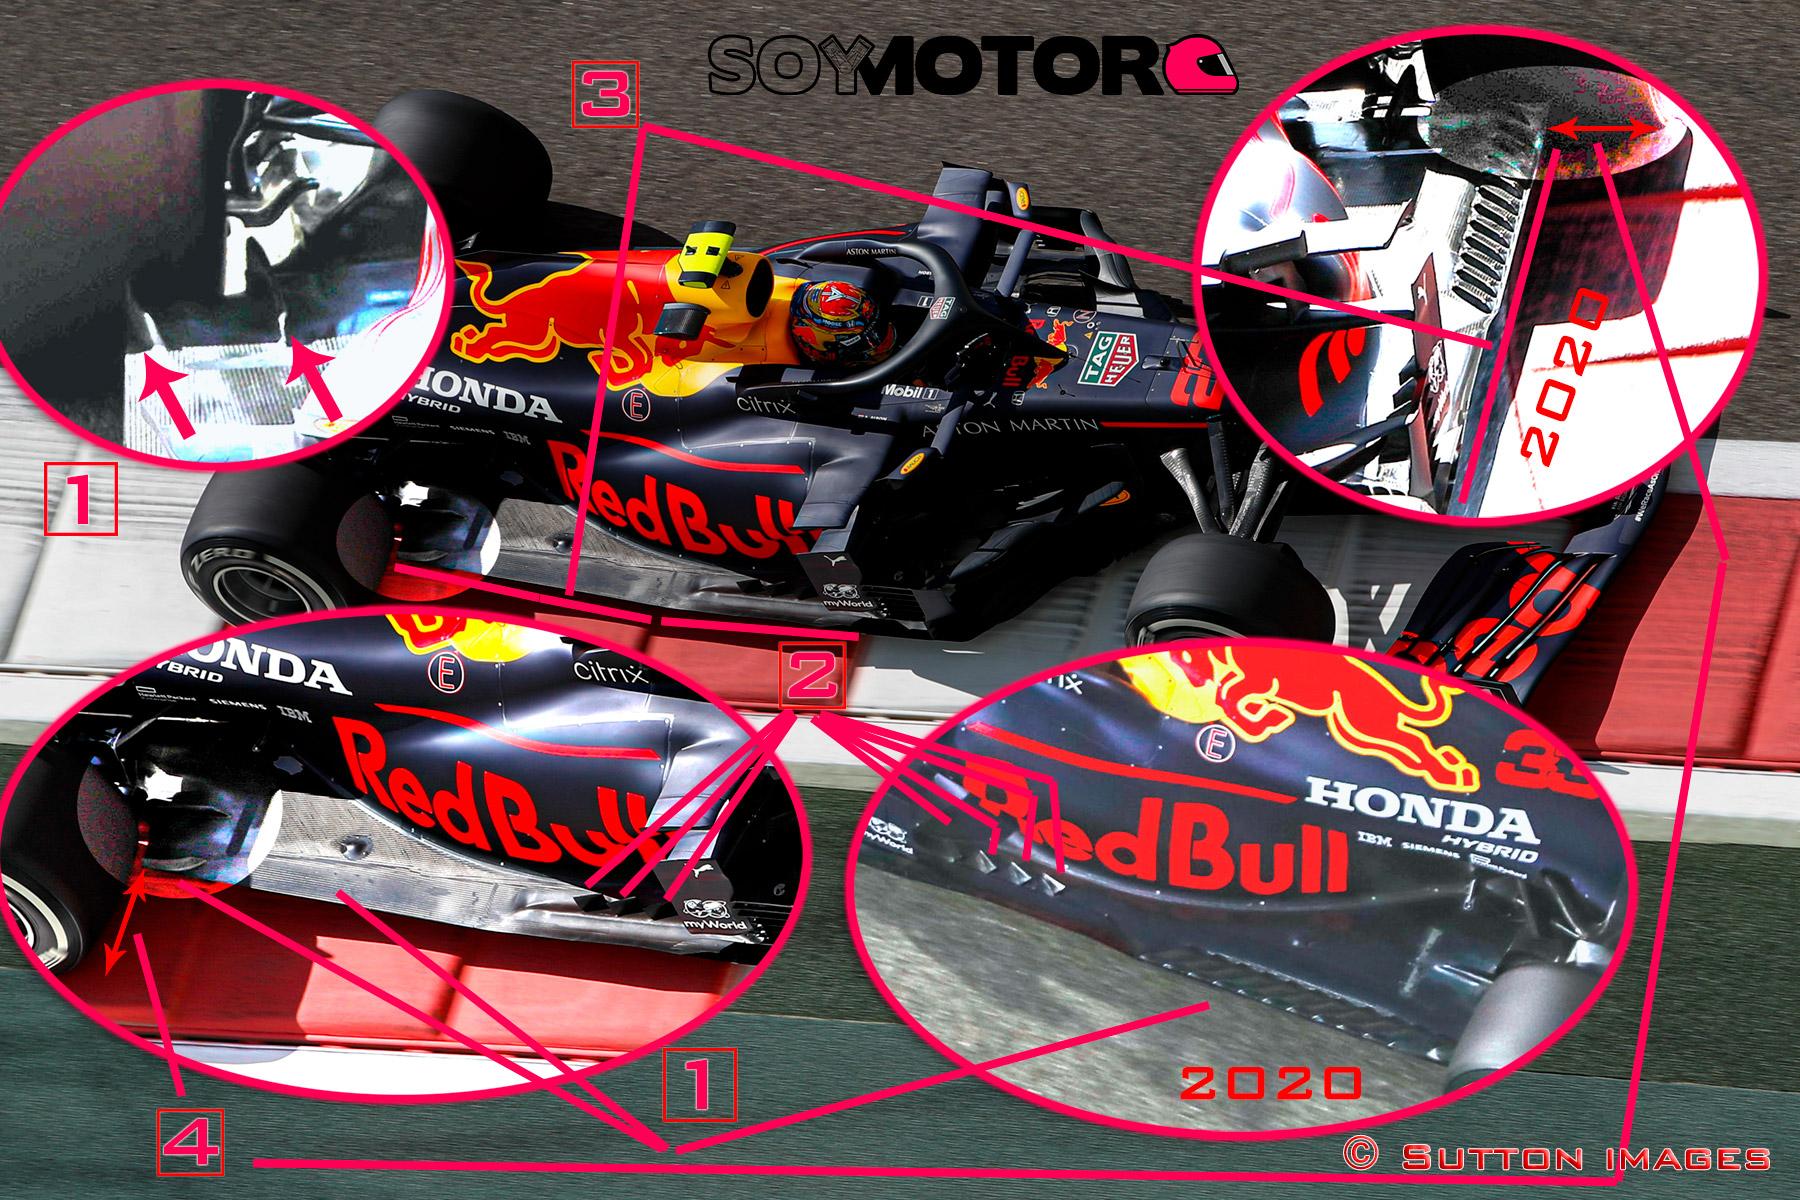 red-bull-suelo-2021-soymotor_0.jpg